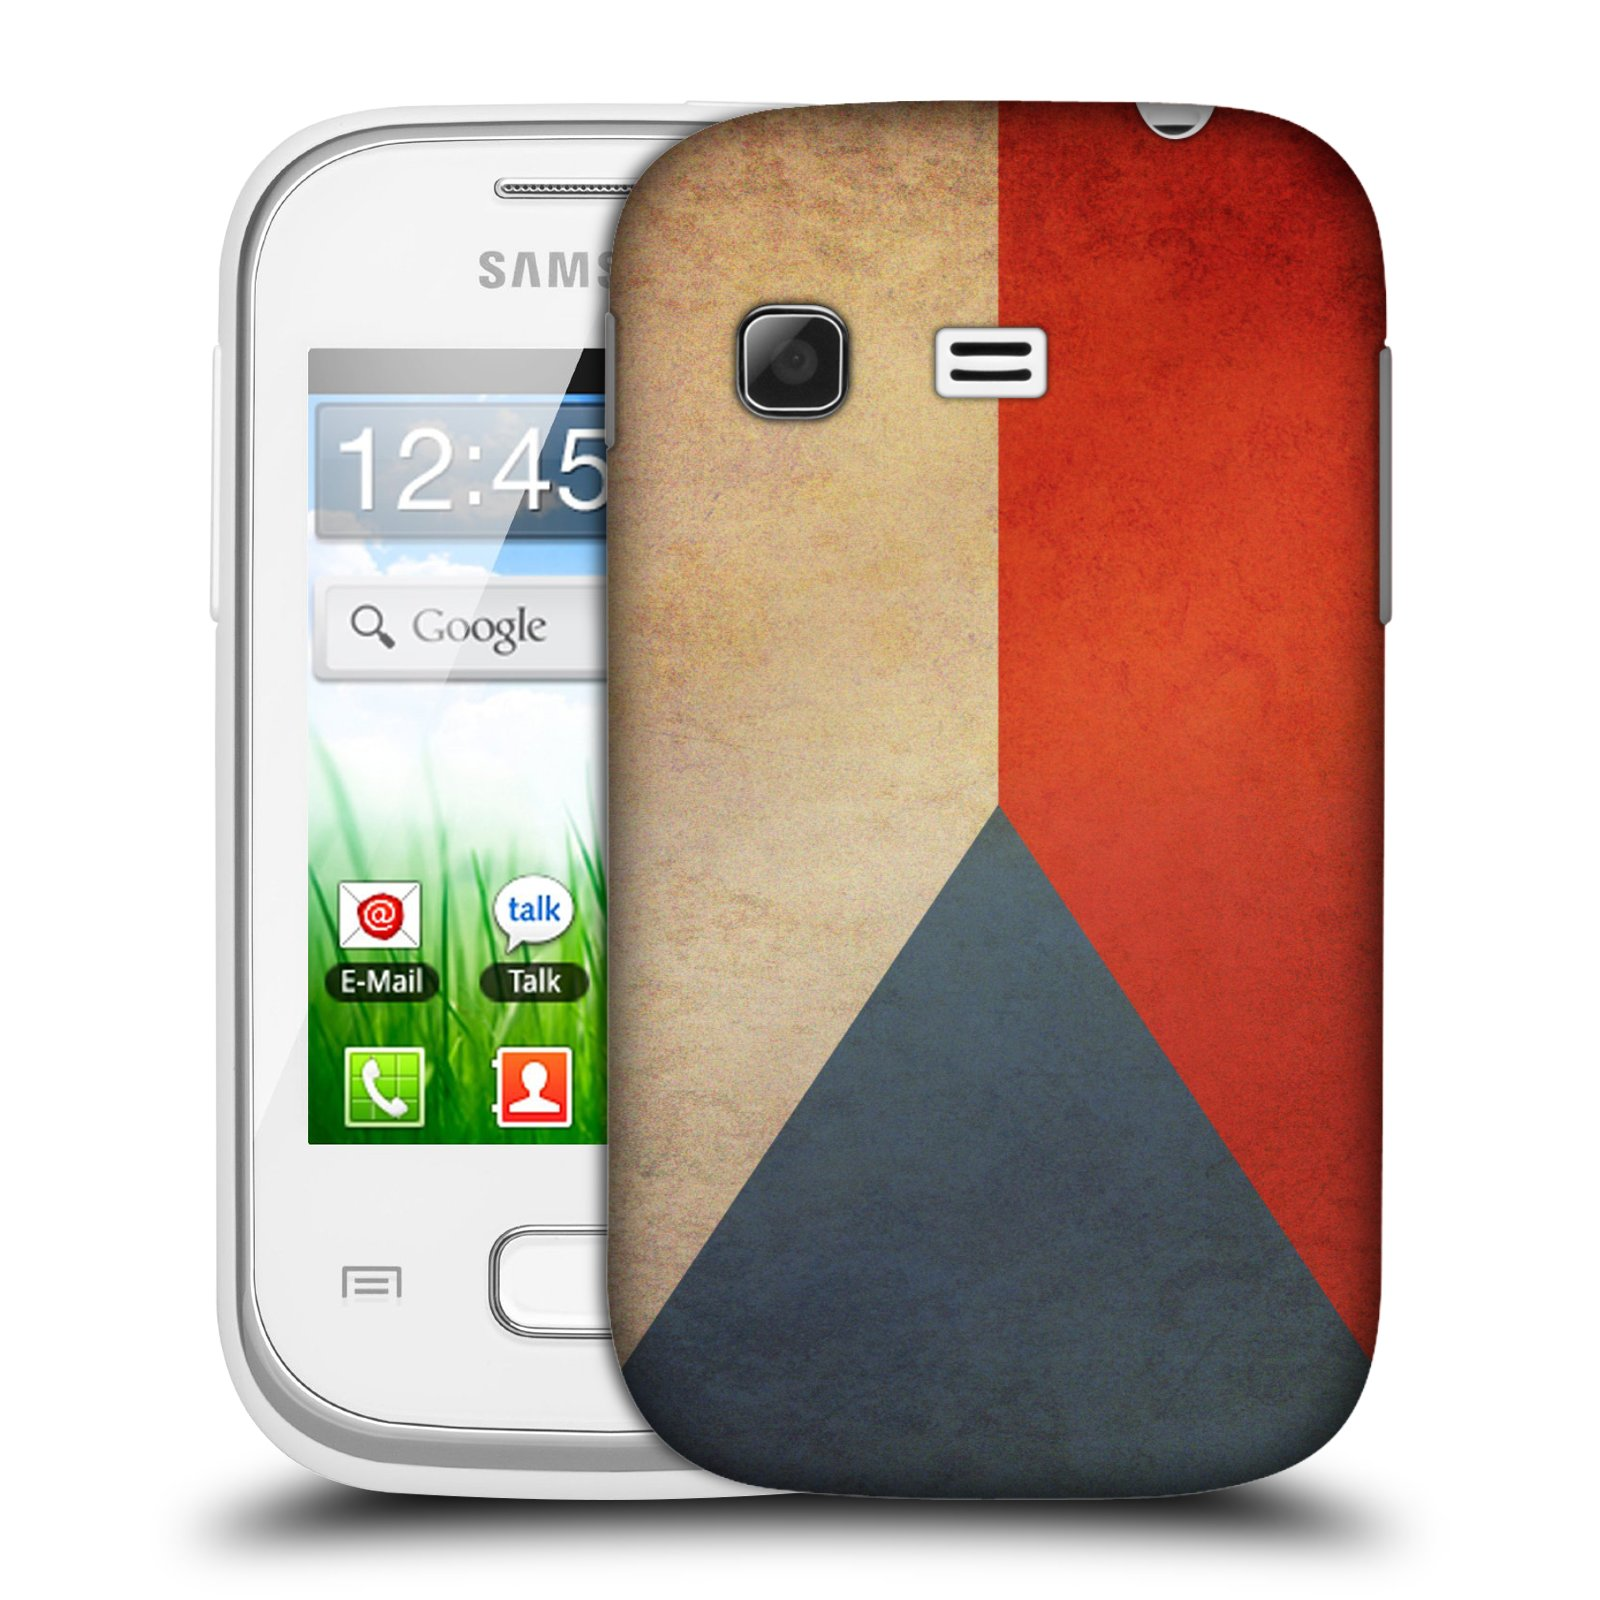 Plastové pouzdro na mobil Samsung Galaxy Pocket HEAD CASE VLAJKA ČESKÁ REPUBLIKA (Kryt či obal na mobilní telefon Samsung Galaxy Pocket GT-S5300)